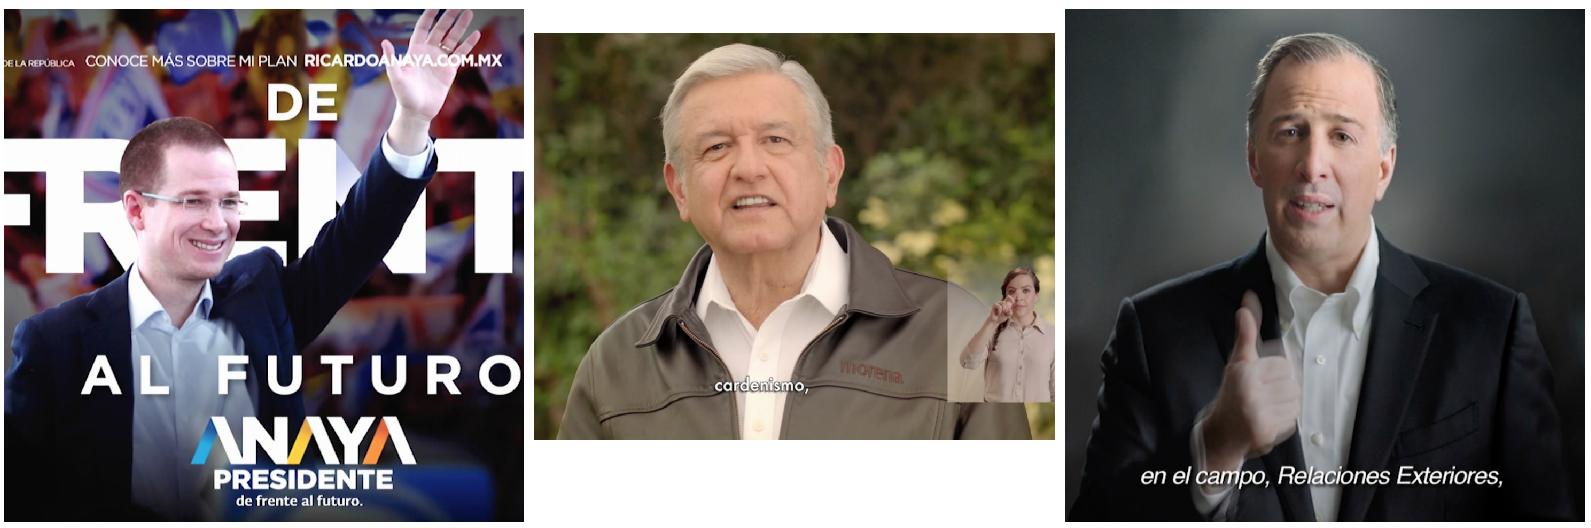 Meade vs. López Obrador vs. Anaya vs. Zavala | Semana 16 | Del 21 al 27 de marzo del 2018